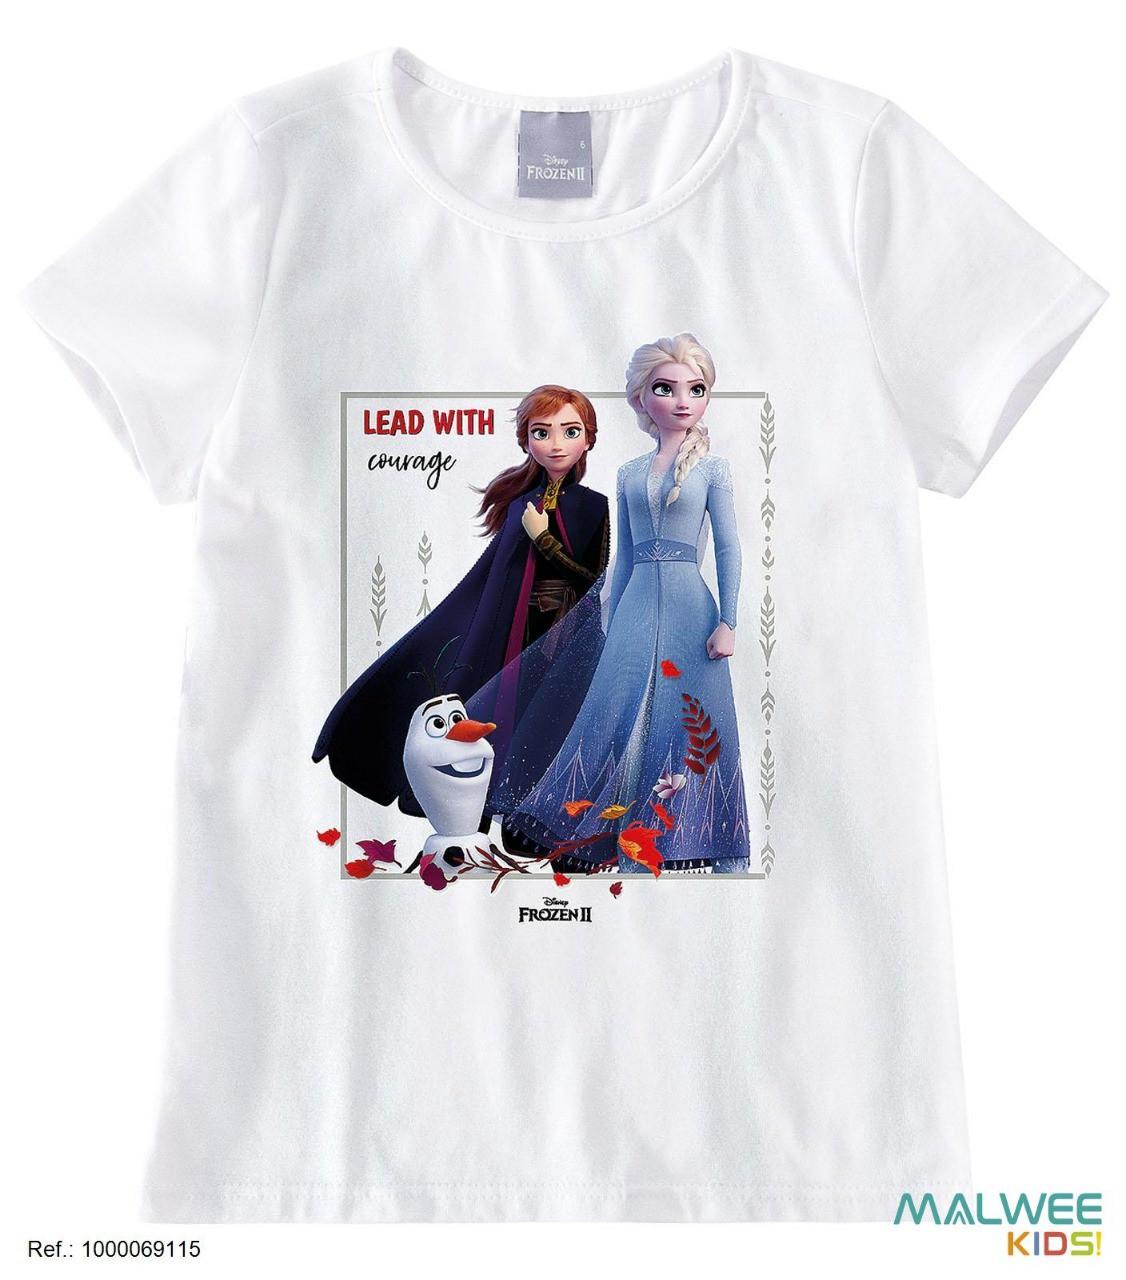 Blusa Algodão Disney Frozen II - Anna e Elsa